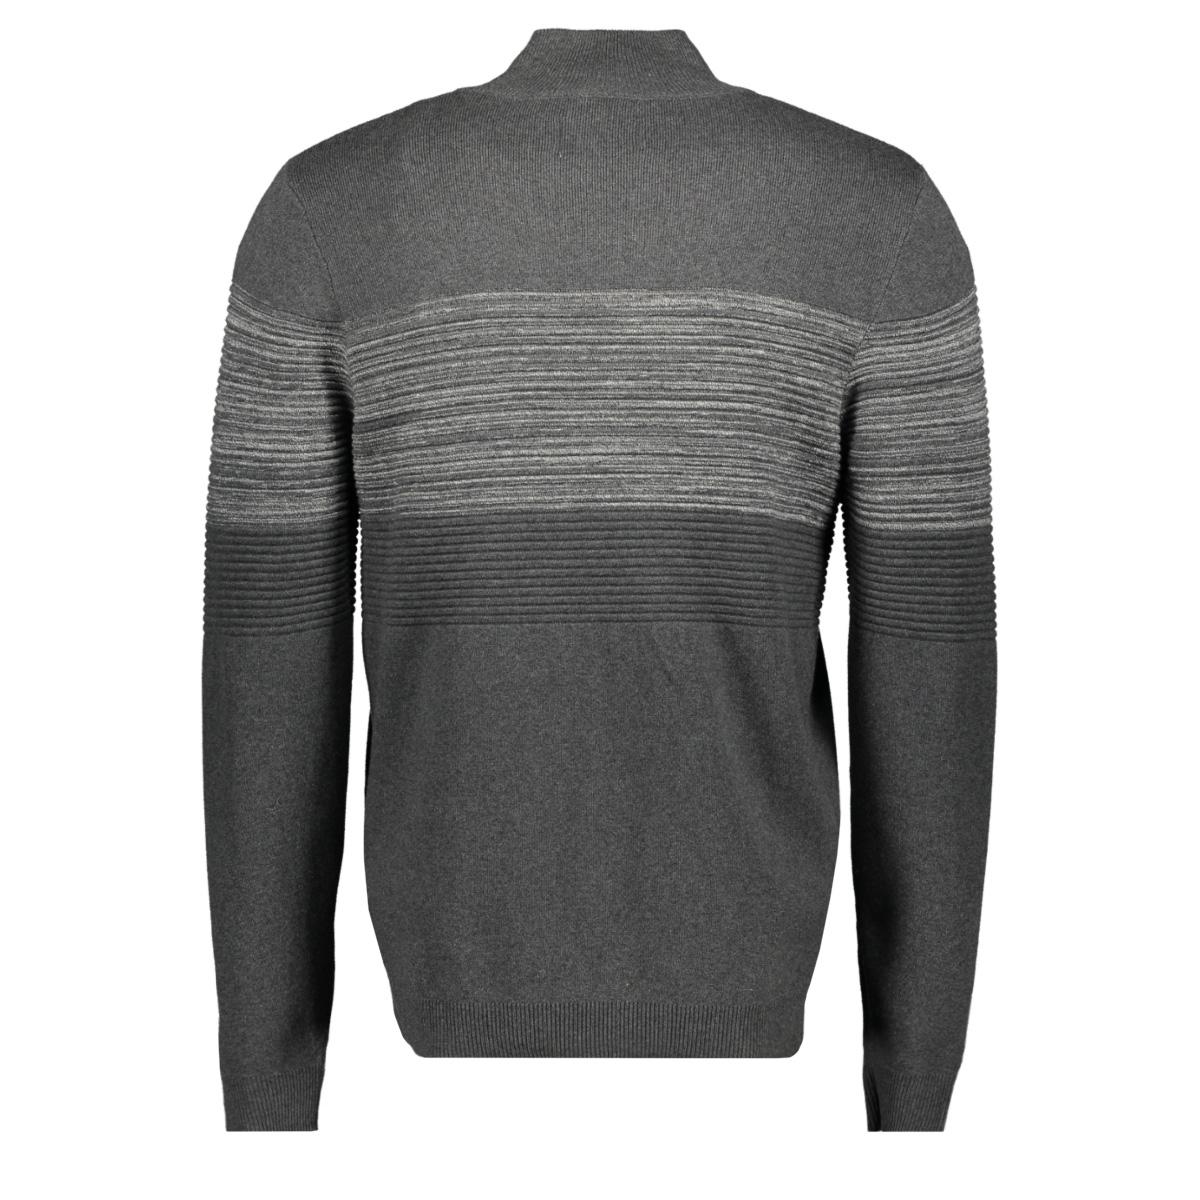 jcoshield knit cardigan 12163346 jack & jones vest dark grey melange